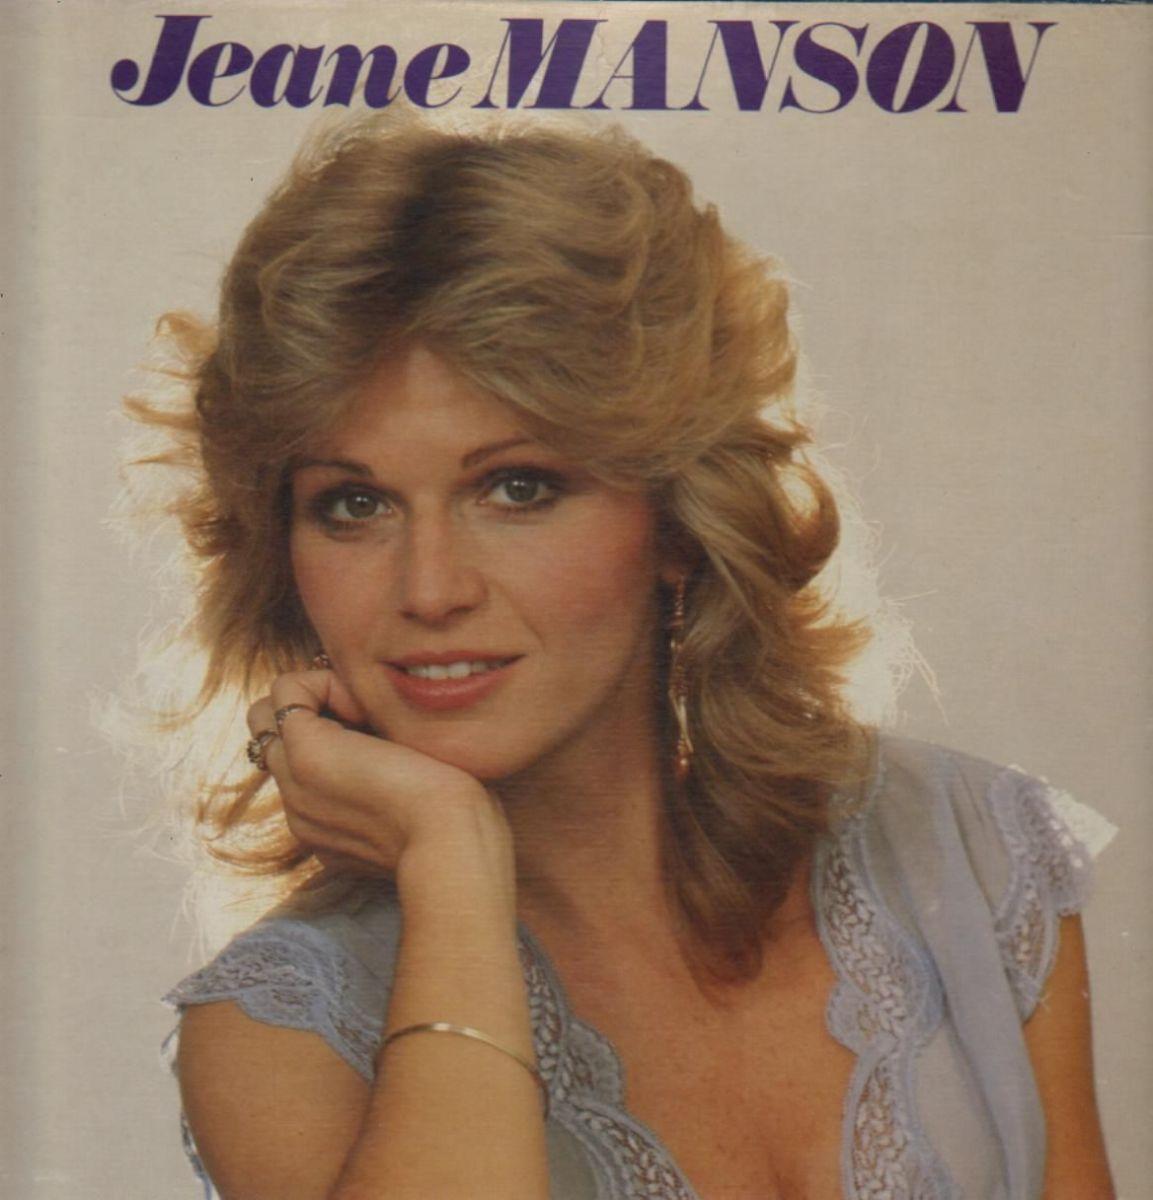 jeane_manson-jeane_manson